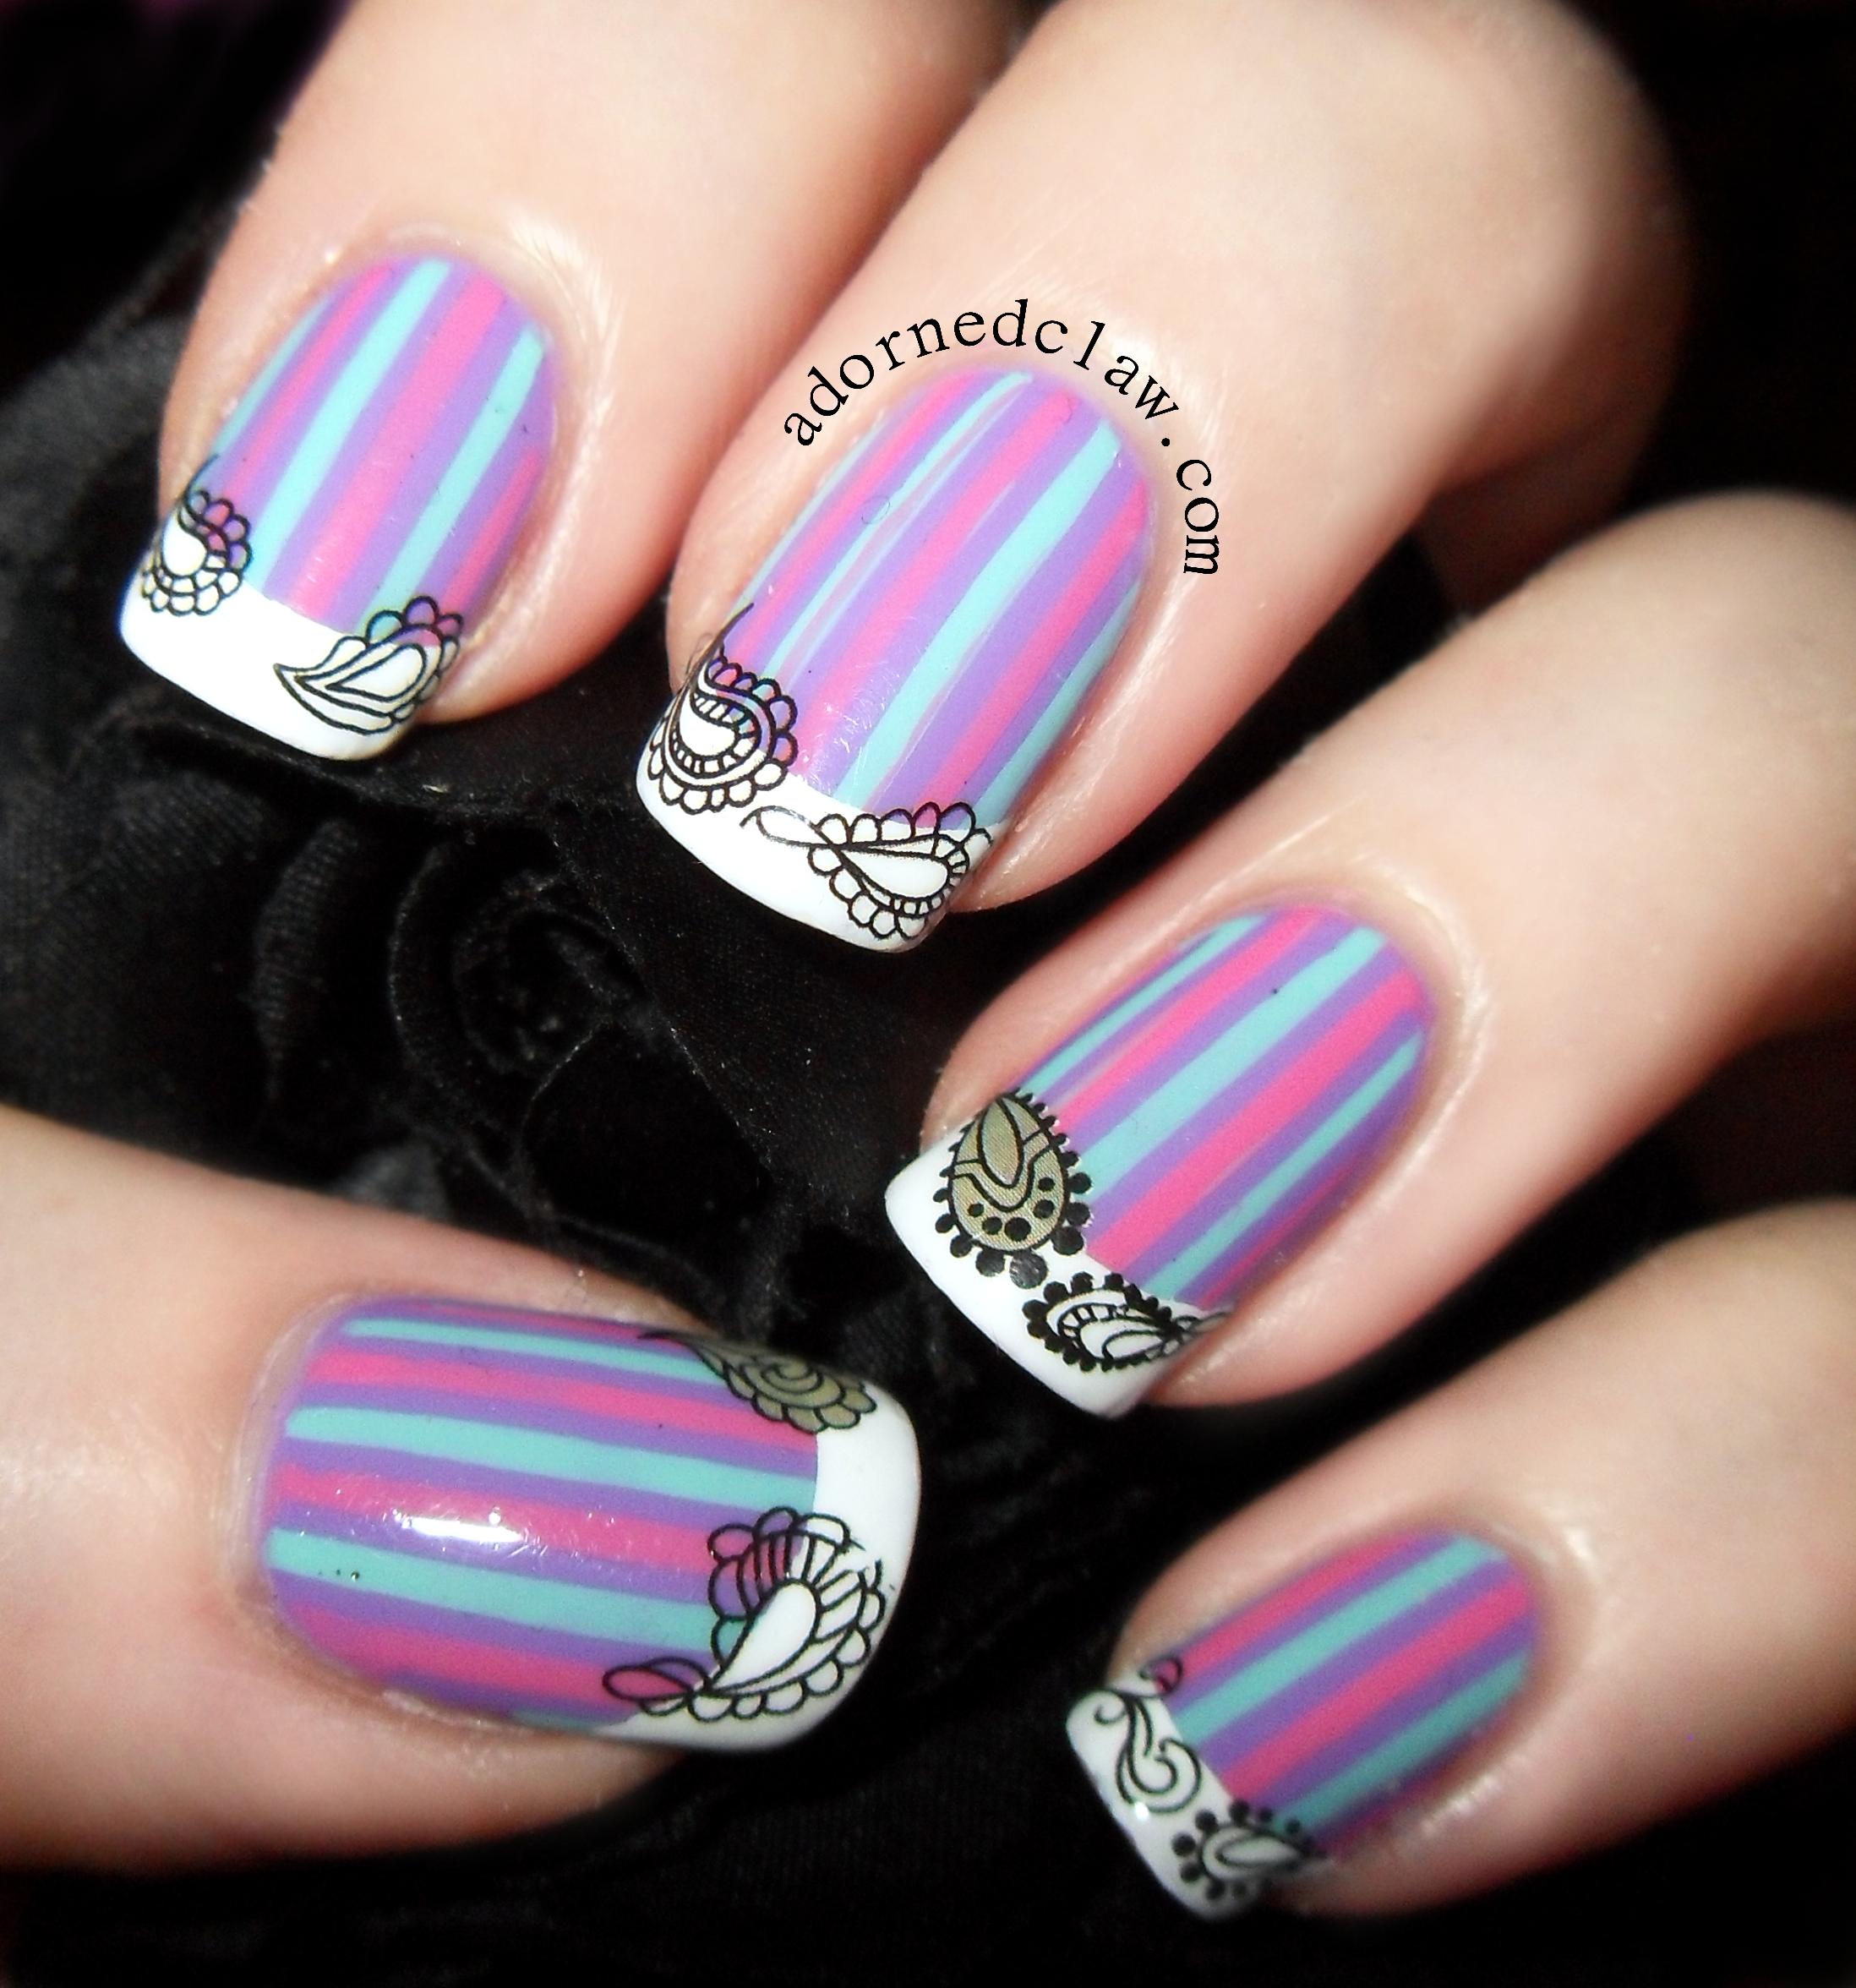 Nail Designs With Striping Tape: Striping Tape Nail Art